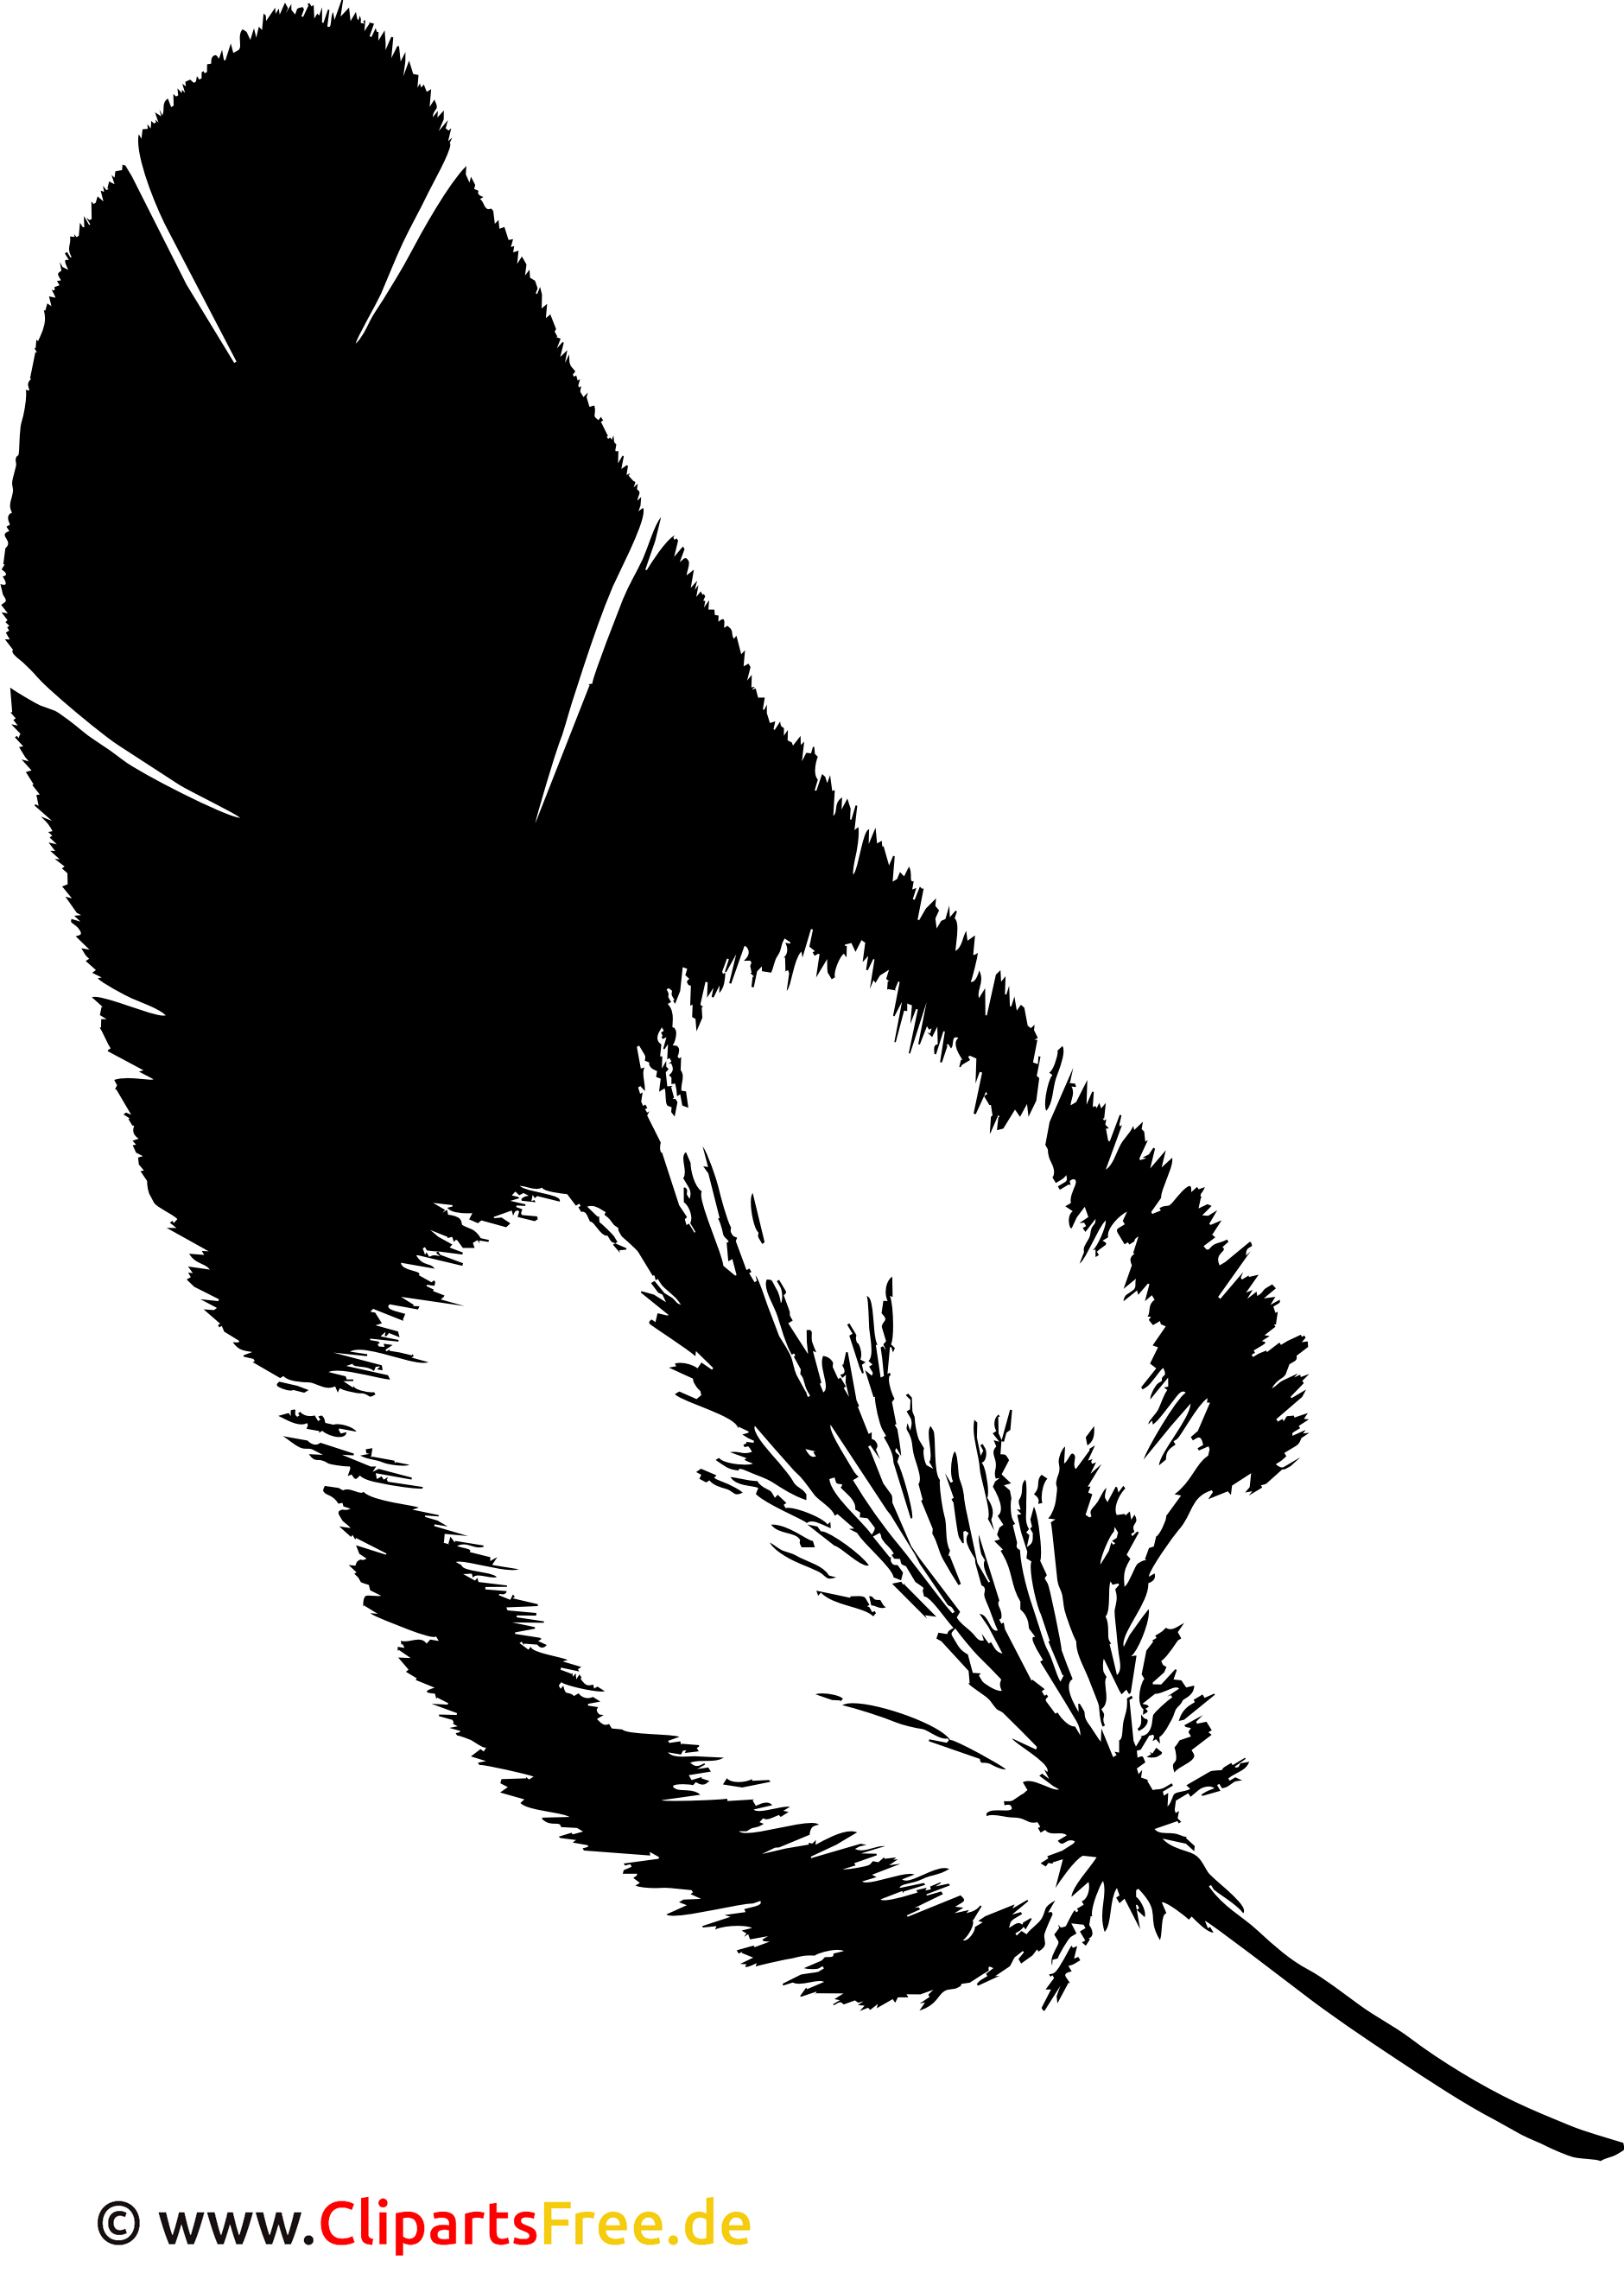 Clipart Feder PNG